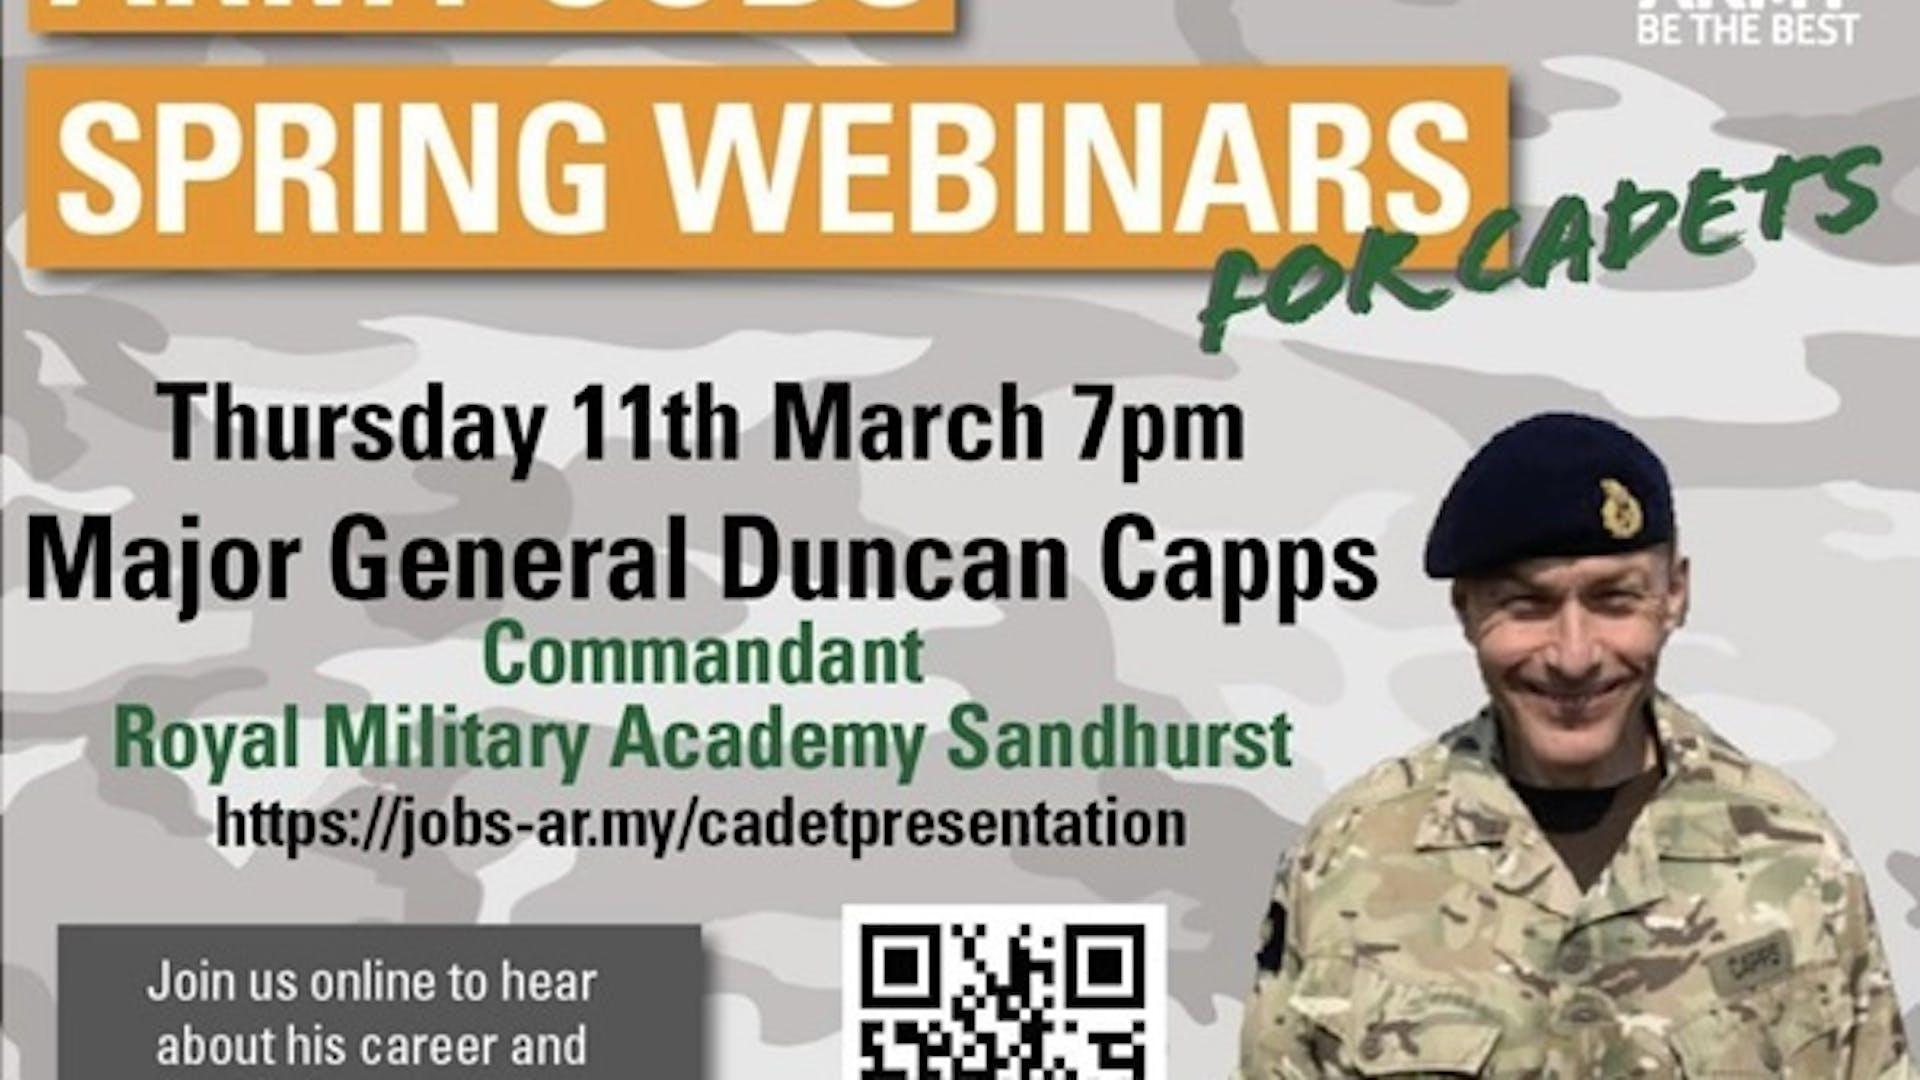 Major General Duncan Capps